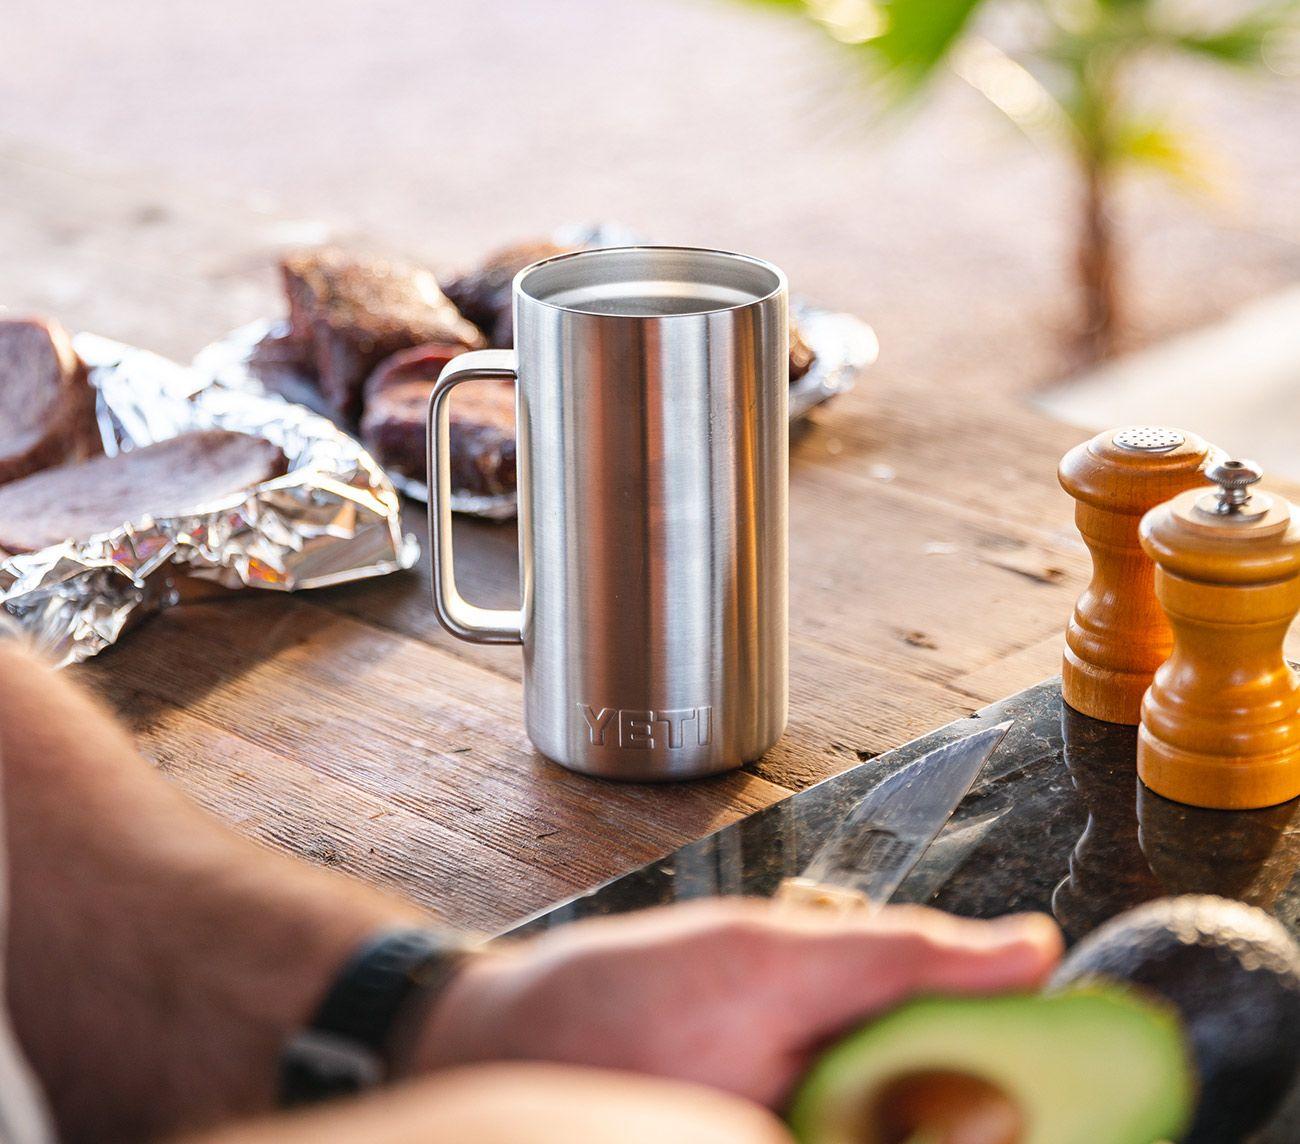 Rambler 24 oz Mug YETI Mugs, Yeti, Yeti cooler